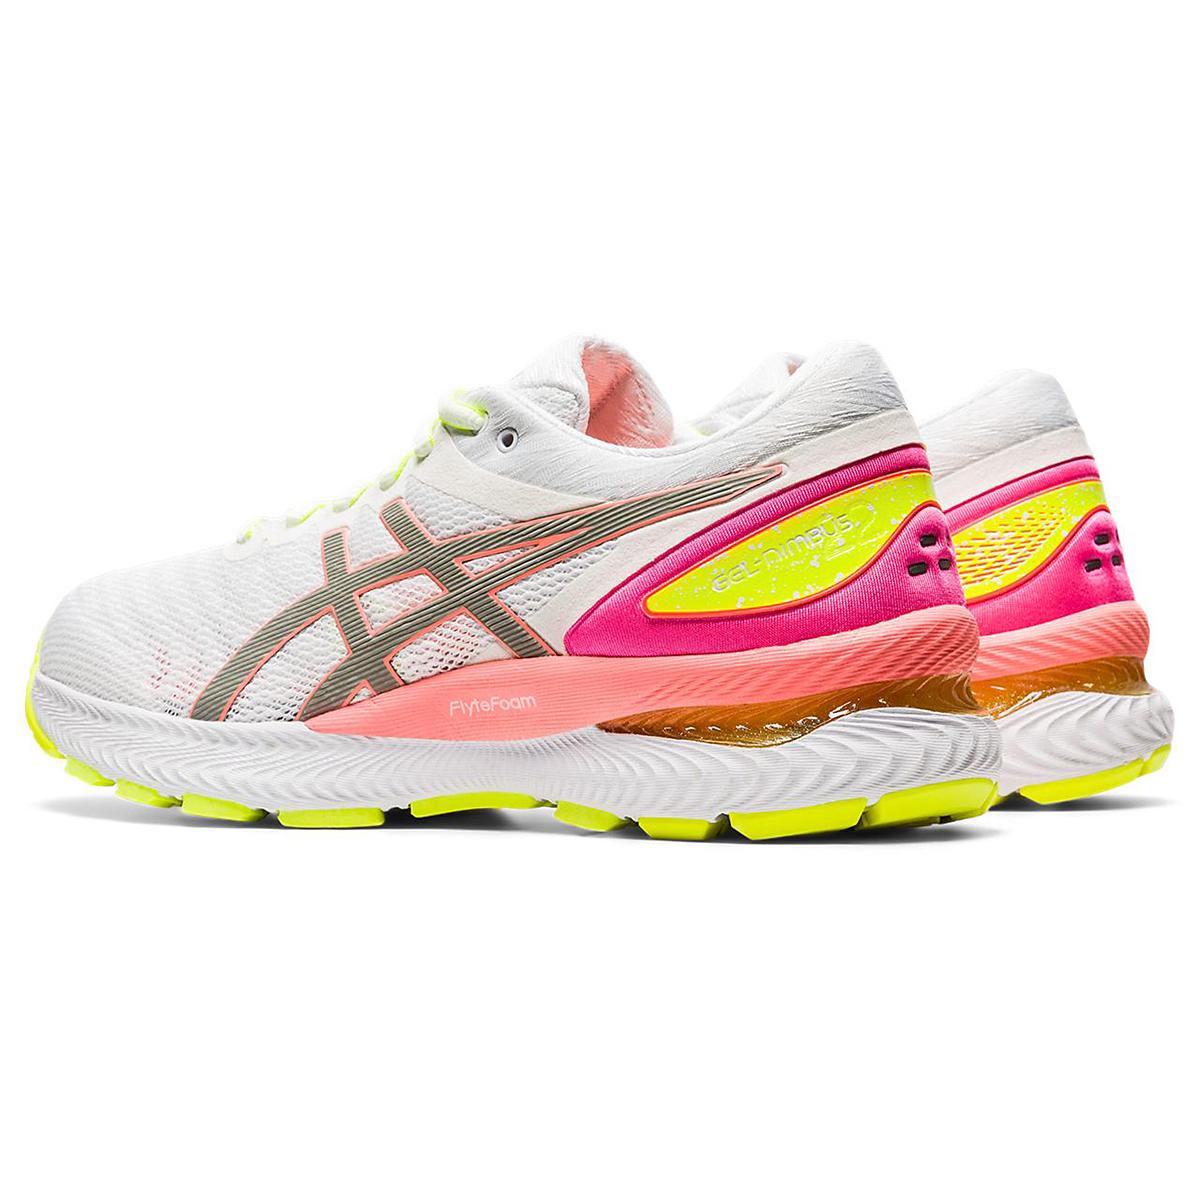 Women's Asics Gel-Nimbus 22 Lite Show Running Shoe - Color: White/Sun Coral - Size: 5 - Width: Regular, White/Sun Coral, large, image 4